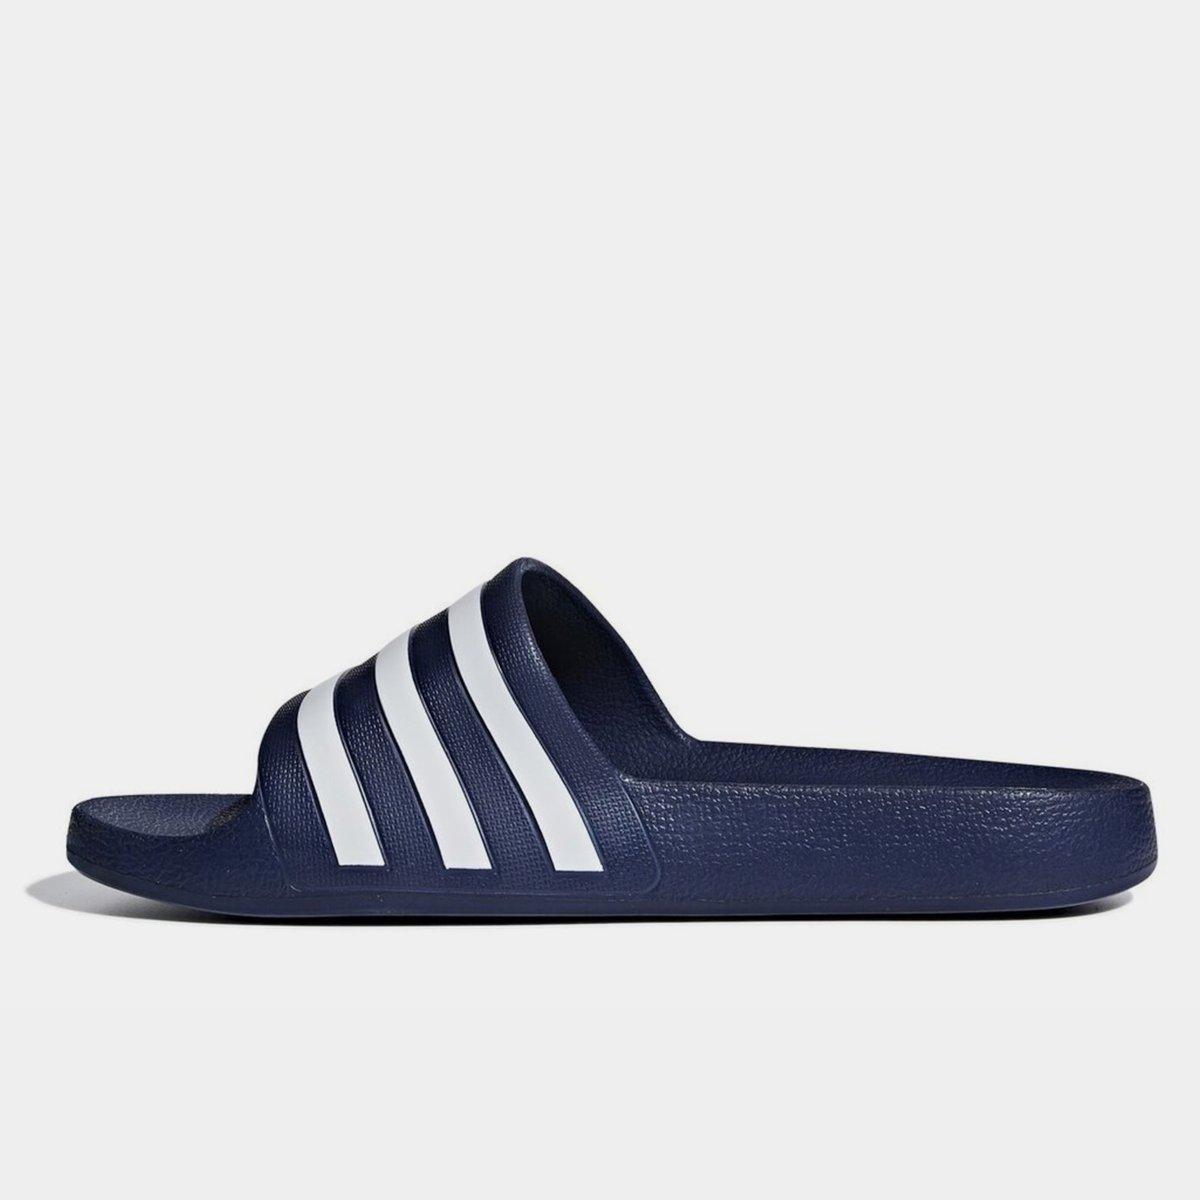 hot sale online fa5e3 ddbe2 adidas Mens Duramo Slide Flip Flops Sliders Pool Beach Sandals Navy